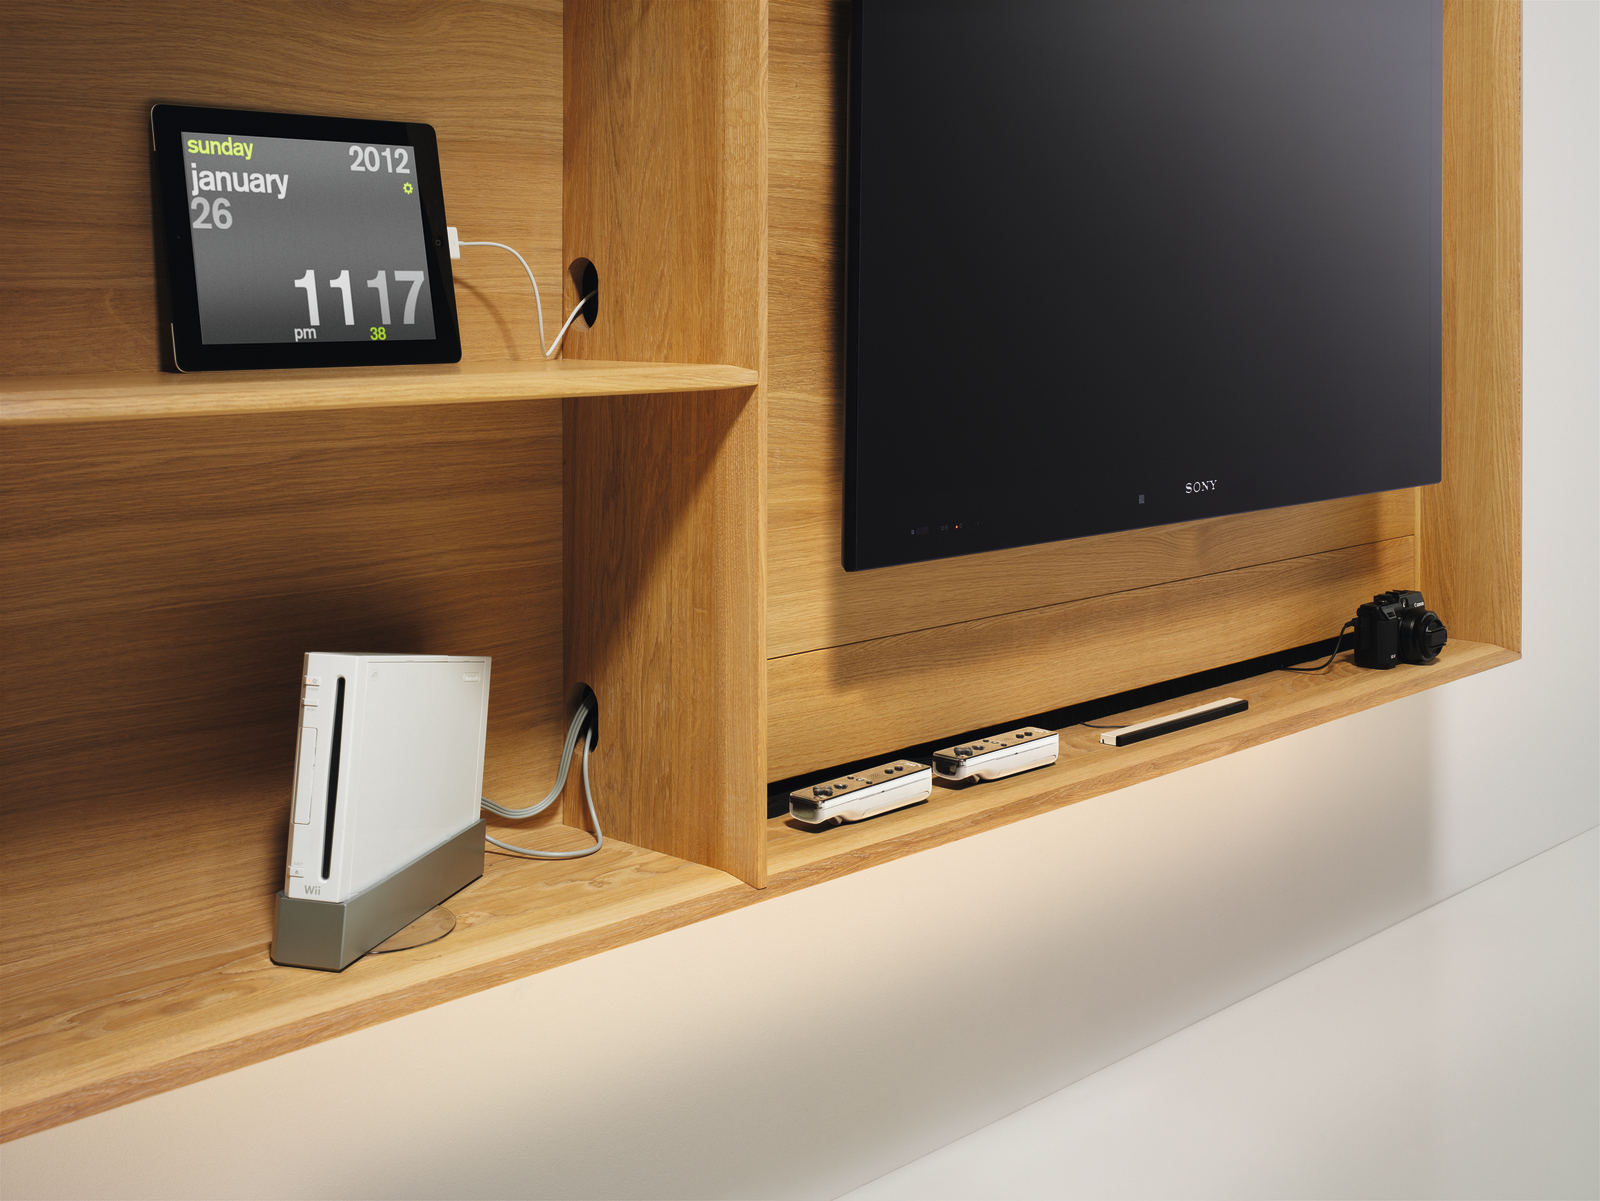 Lux tv kast wandkast noordkaap meubelen for Tv wandkast